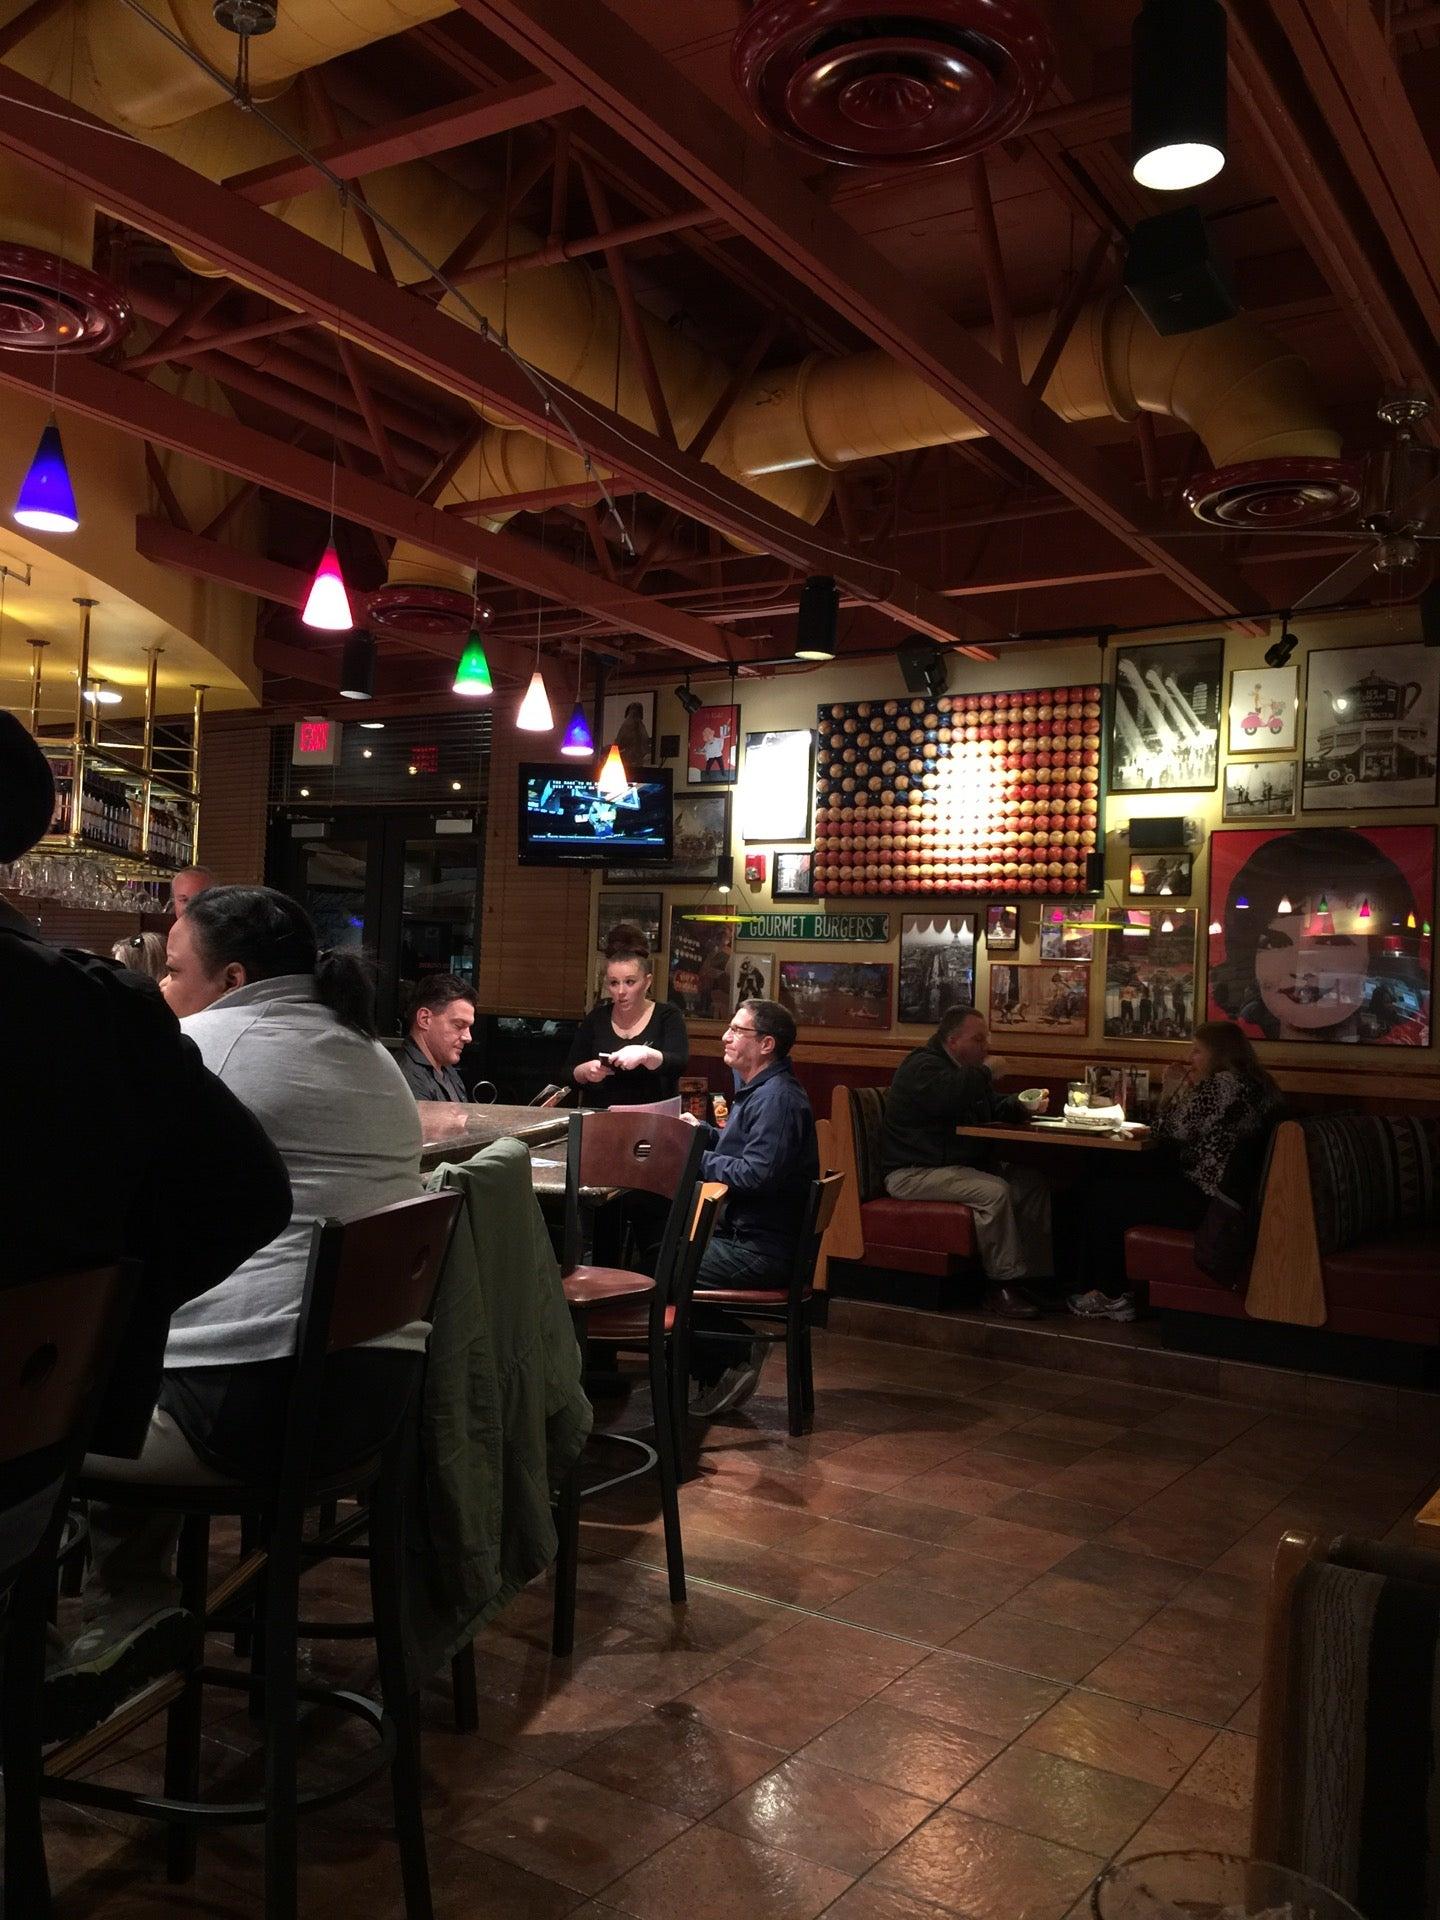 Red Robin,american restaurants,burgers,family style restaurants,fries,horrible service,milkshakes,restaurants,sandwiches